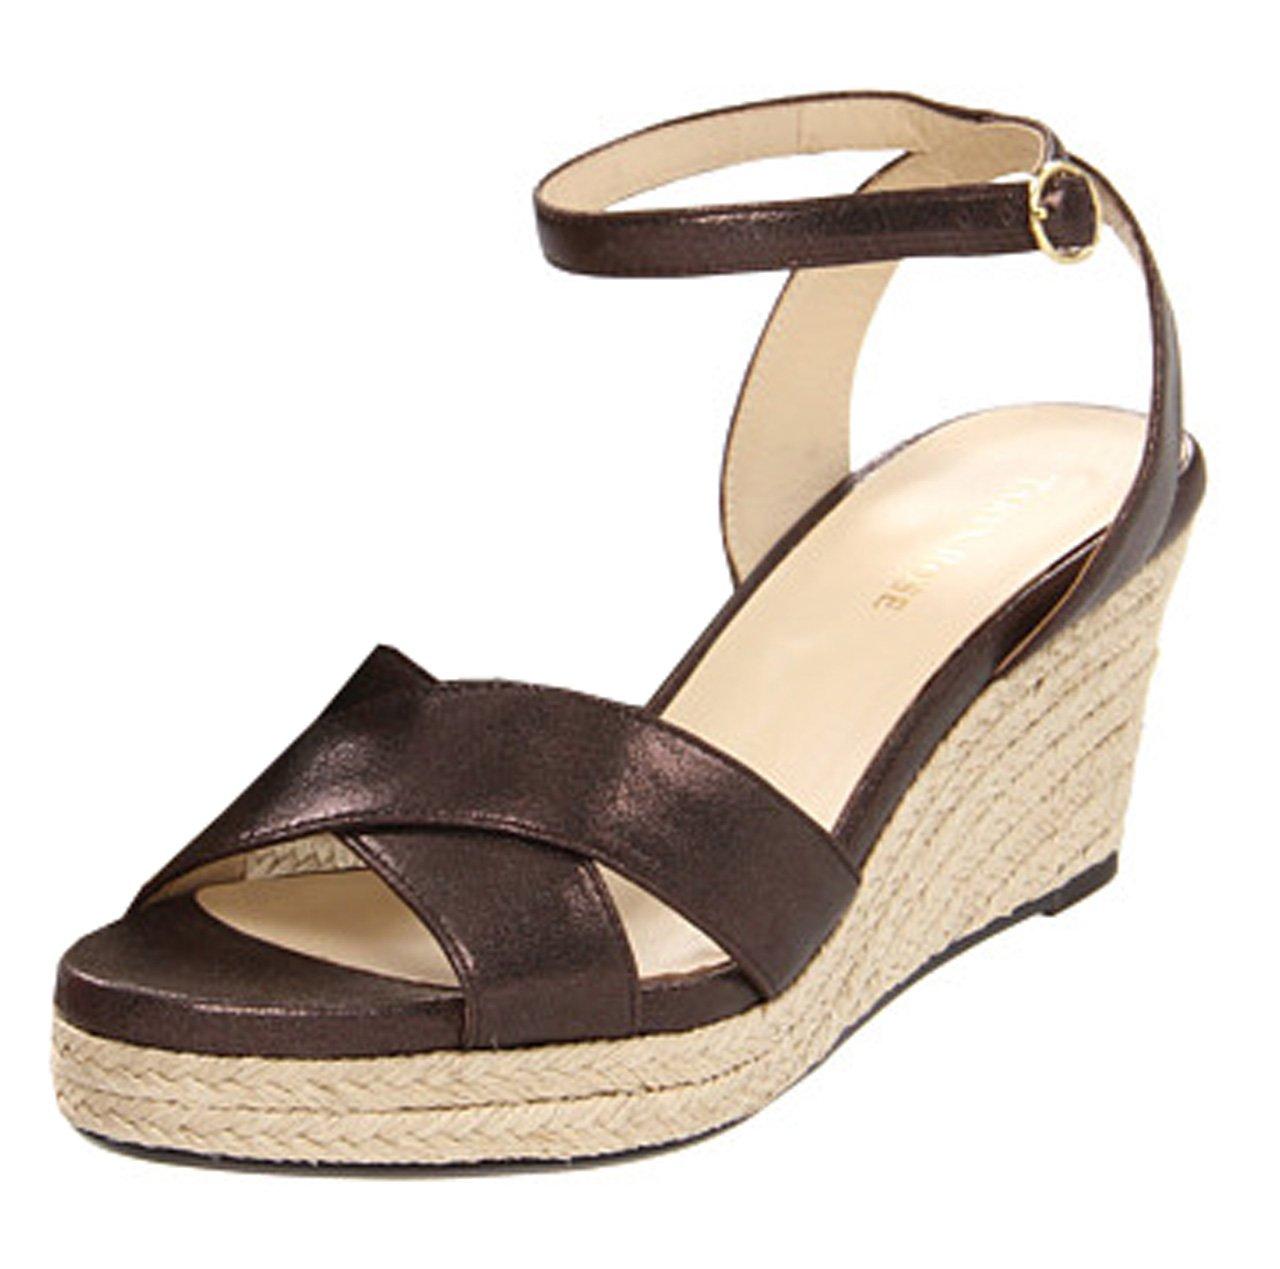 Taryn Rose Women Kellen Wedge Sandals B00847M4IM 9 B(M) US Chocolate Metallic Suede